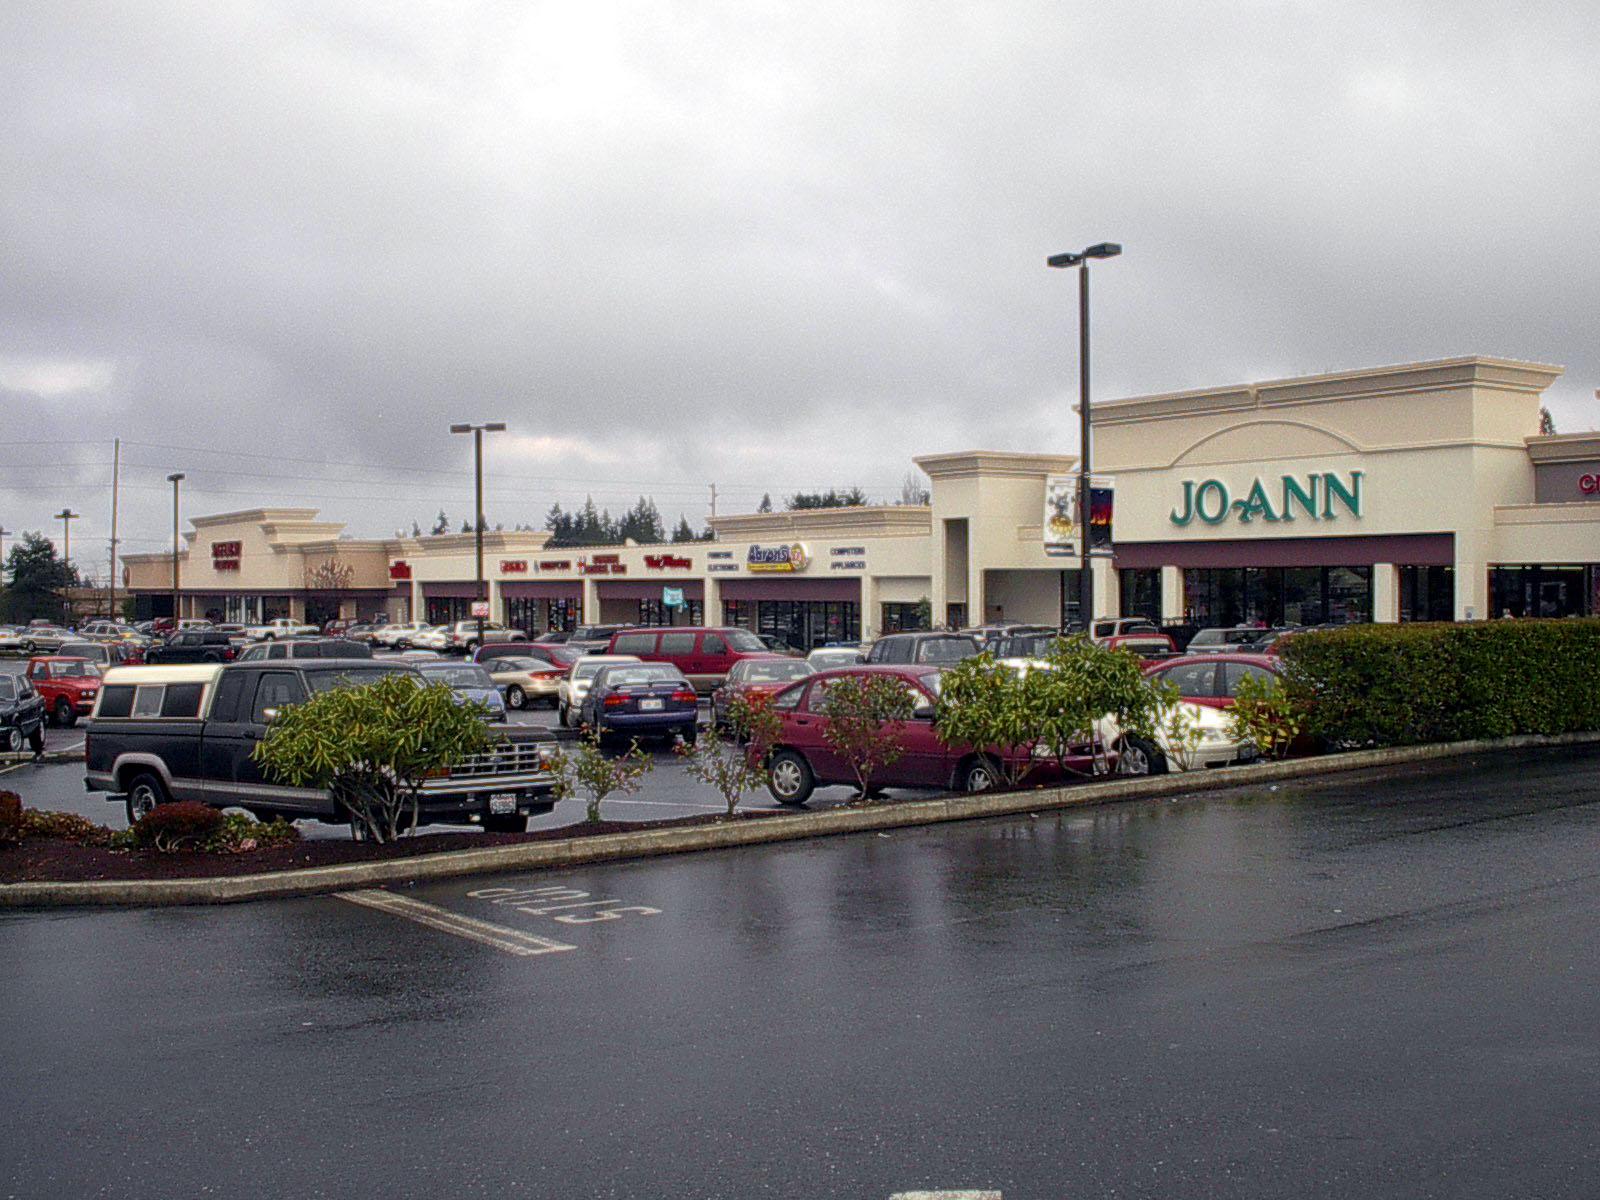 7601 Evergreen Way Property Photo - Everett, WA real estate listing